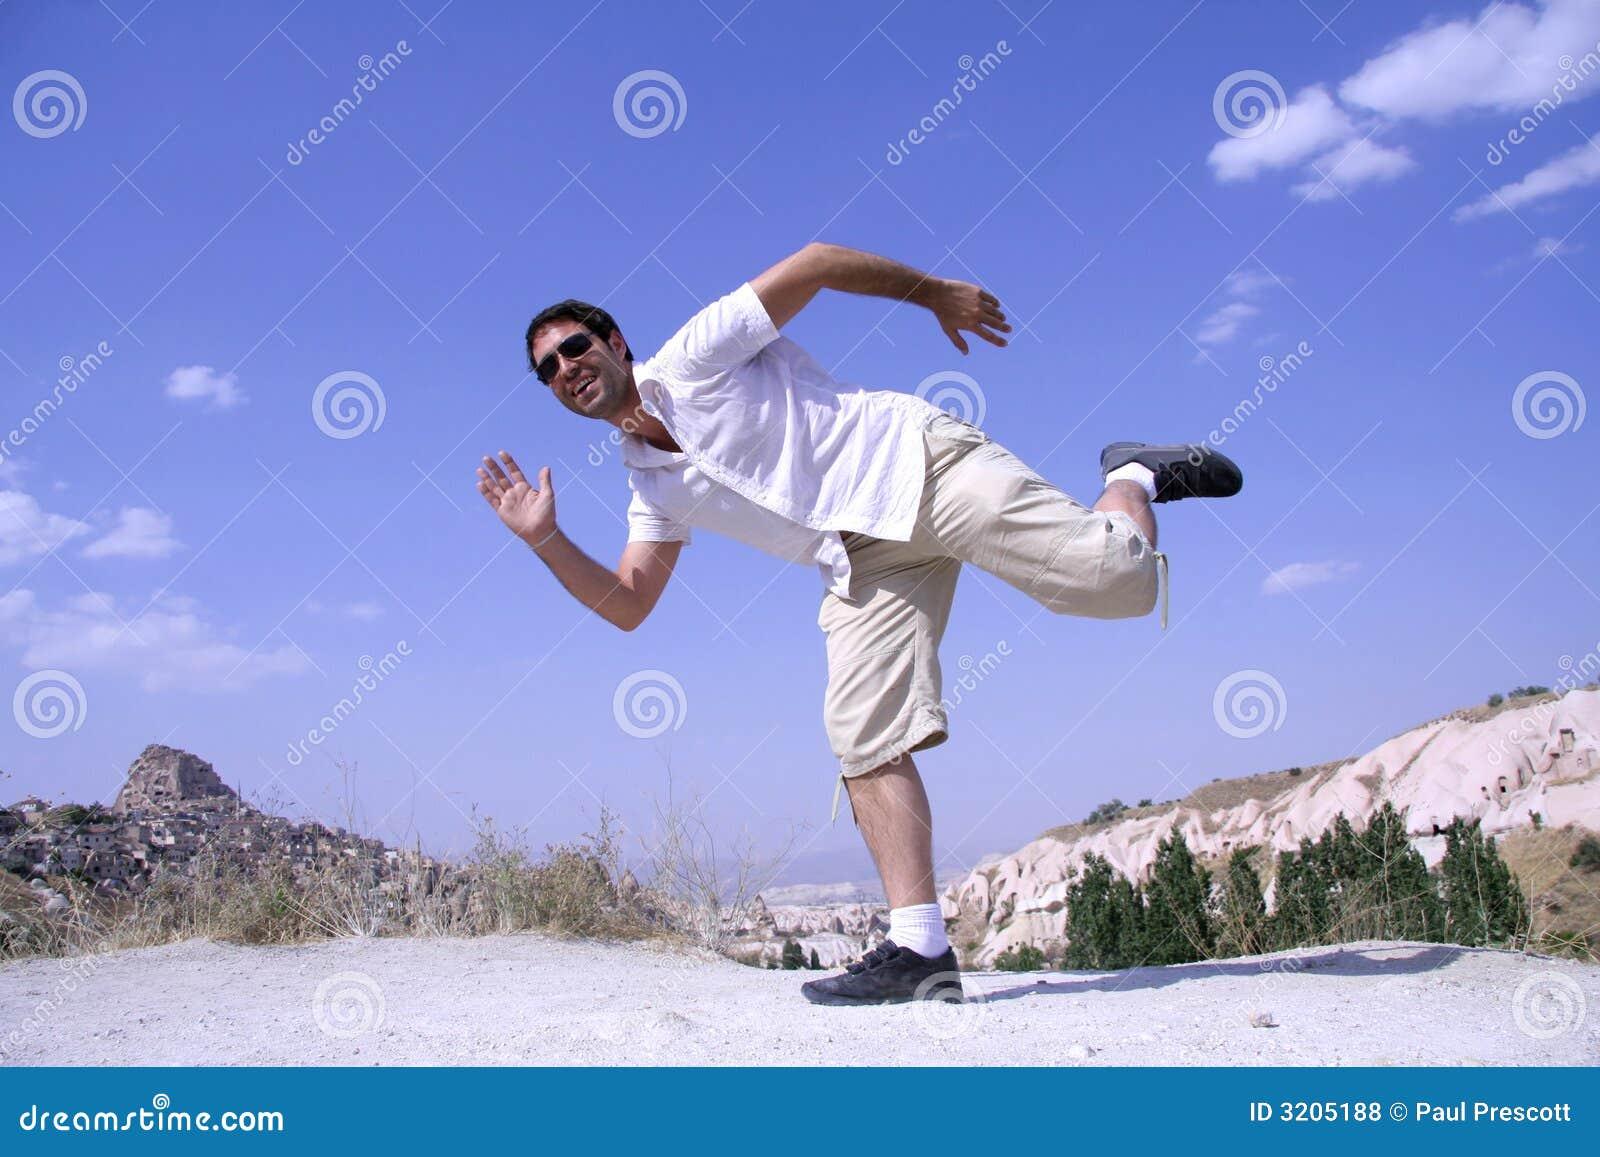 man jumping in joy royalty free stock photos image 3205188